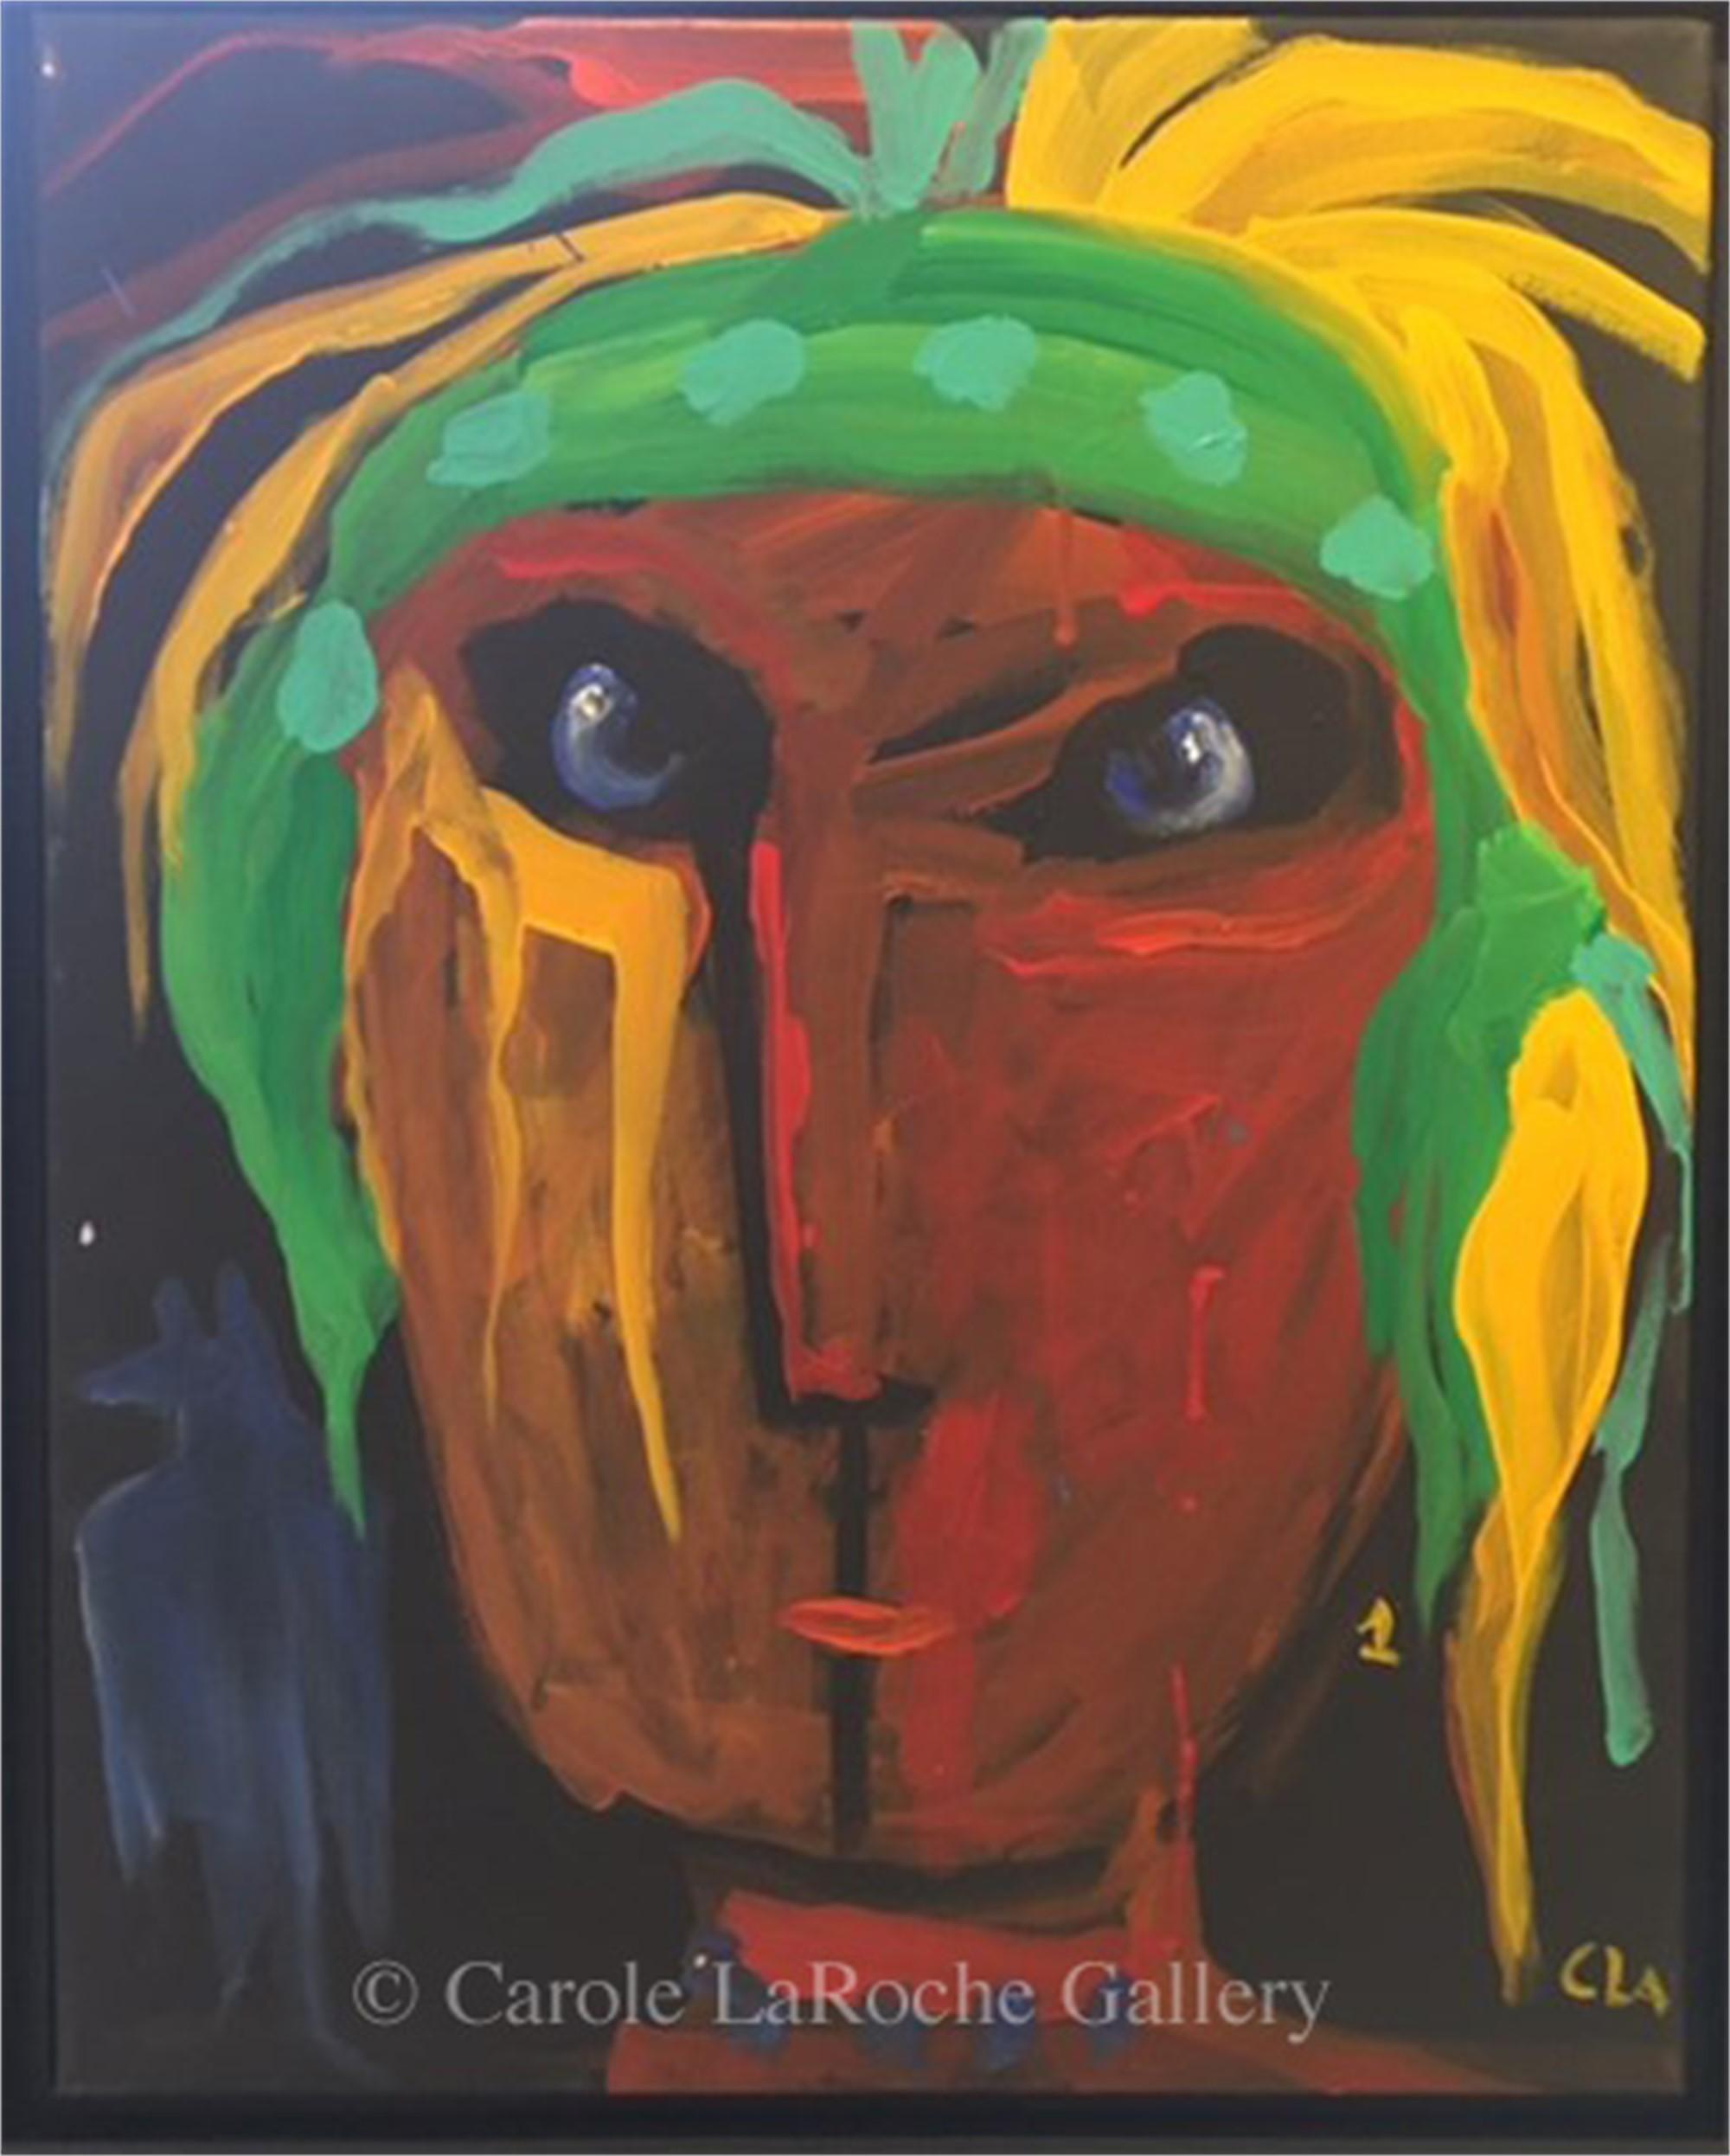 TRIBESMAN #1 by Carole LaRoche